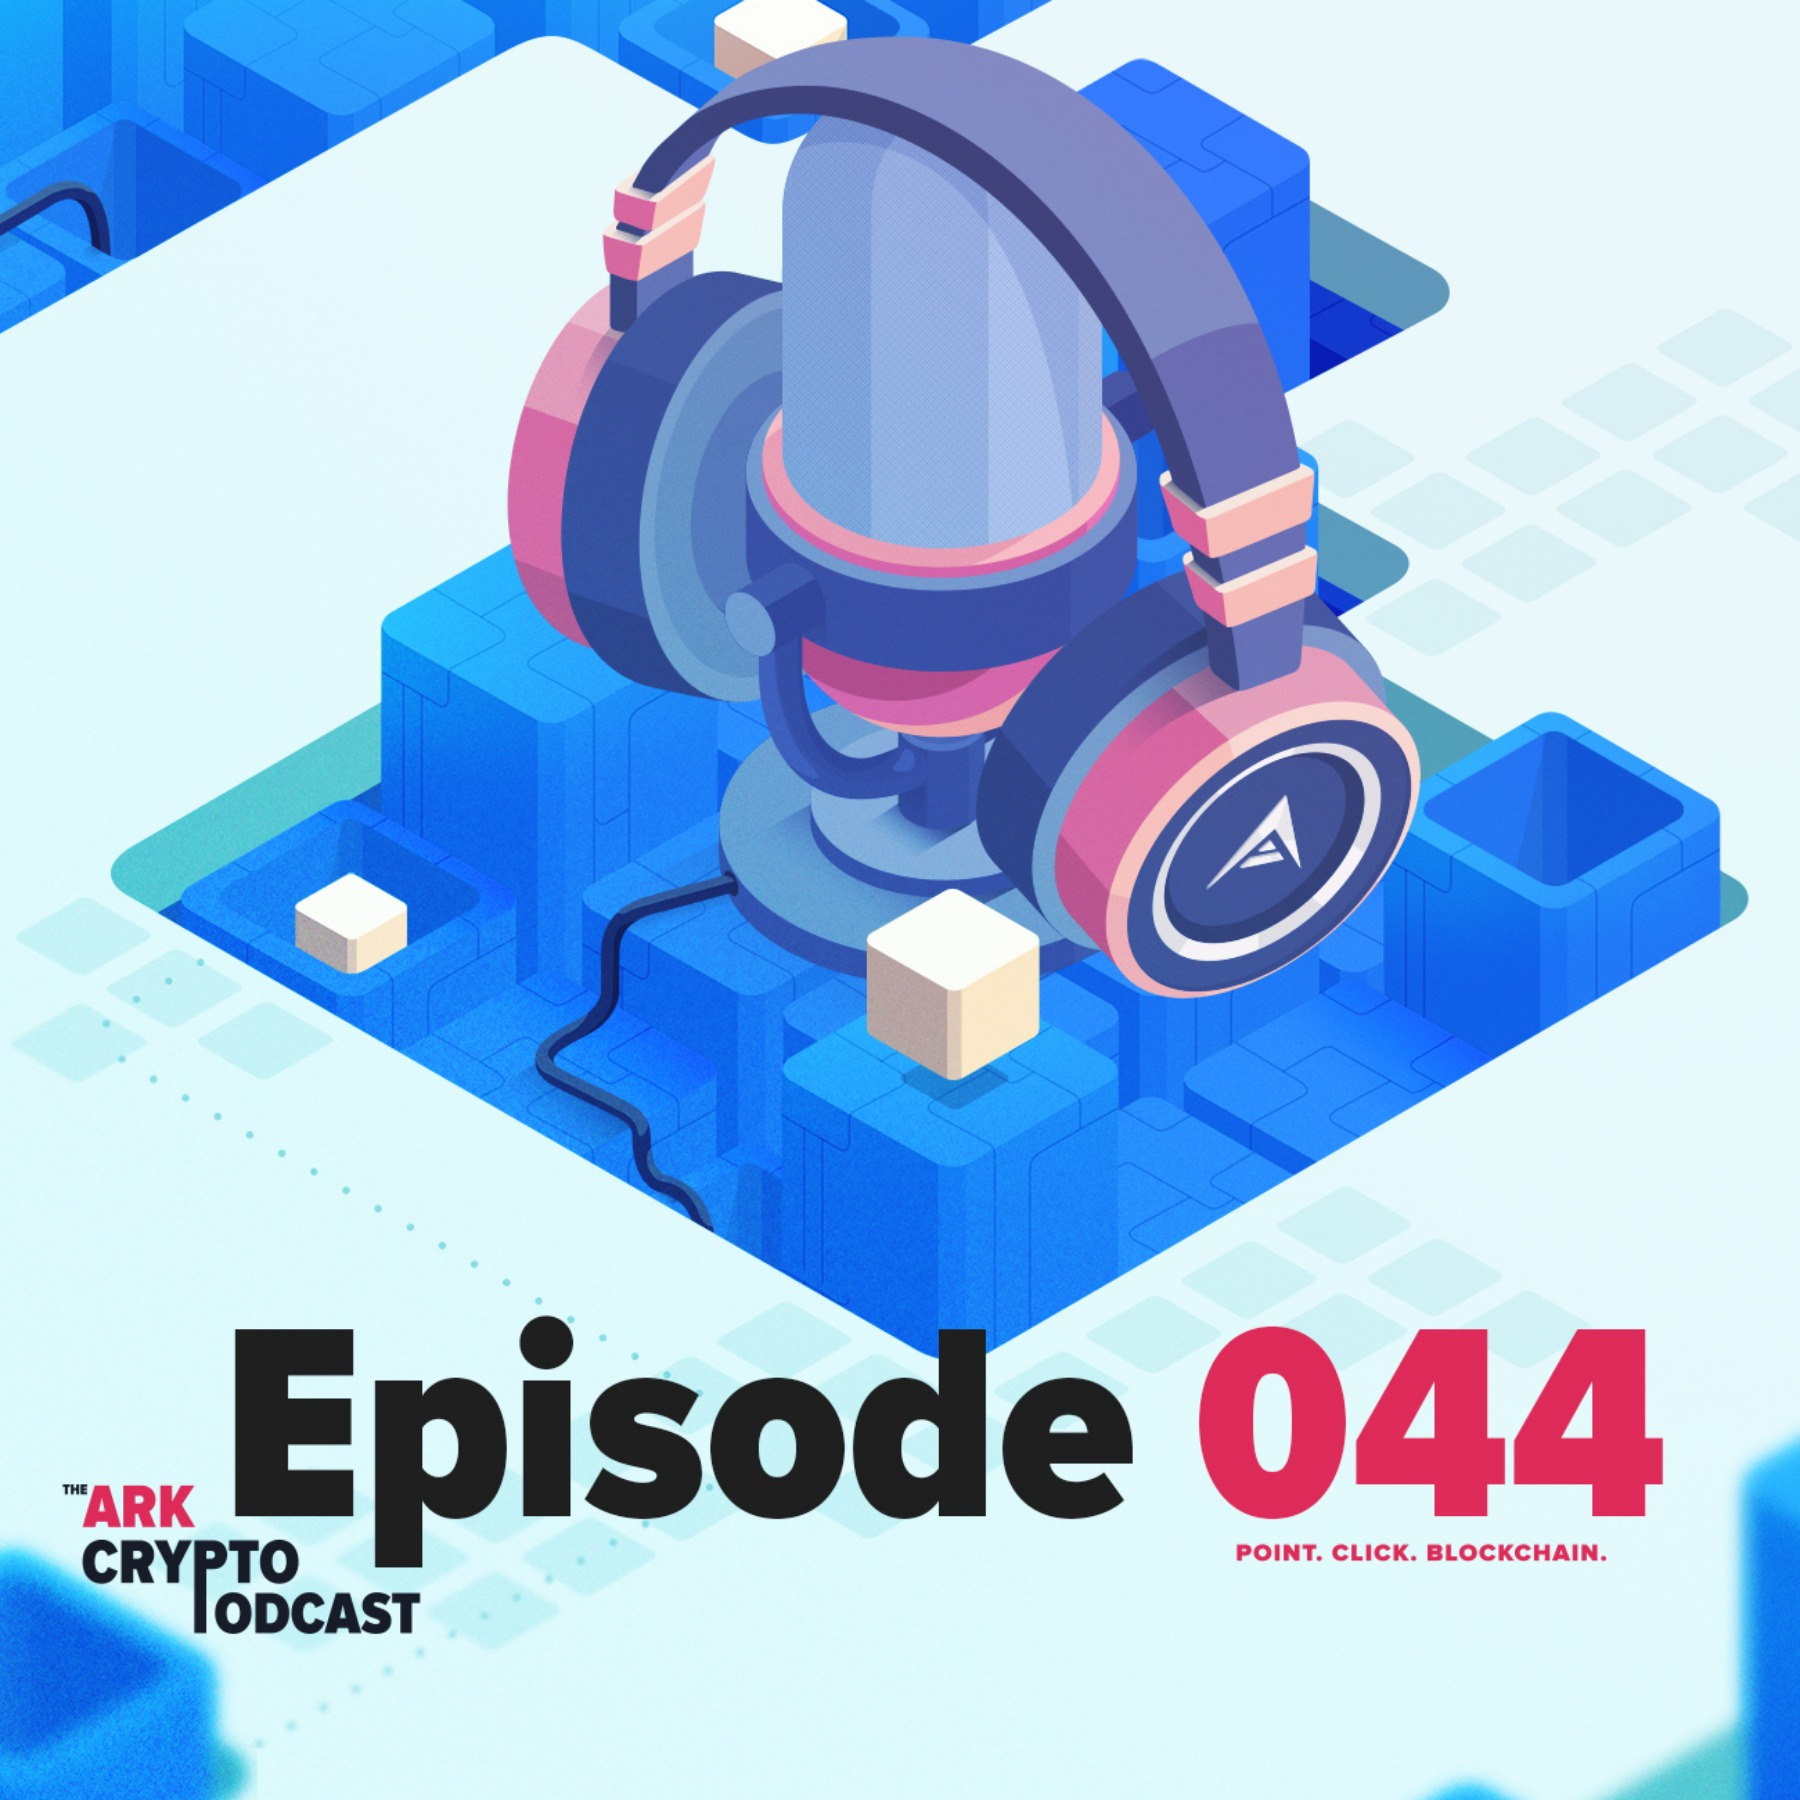 ARK Crypto Podcast #044 - Back to Basics ARK FAQ Episode